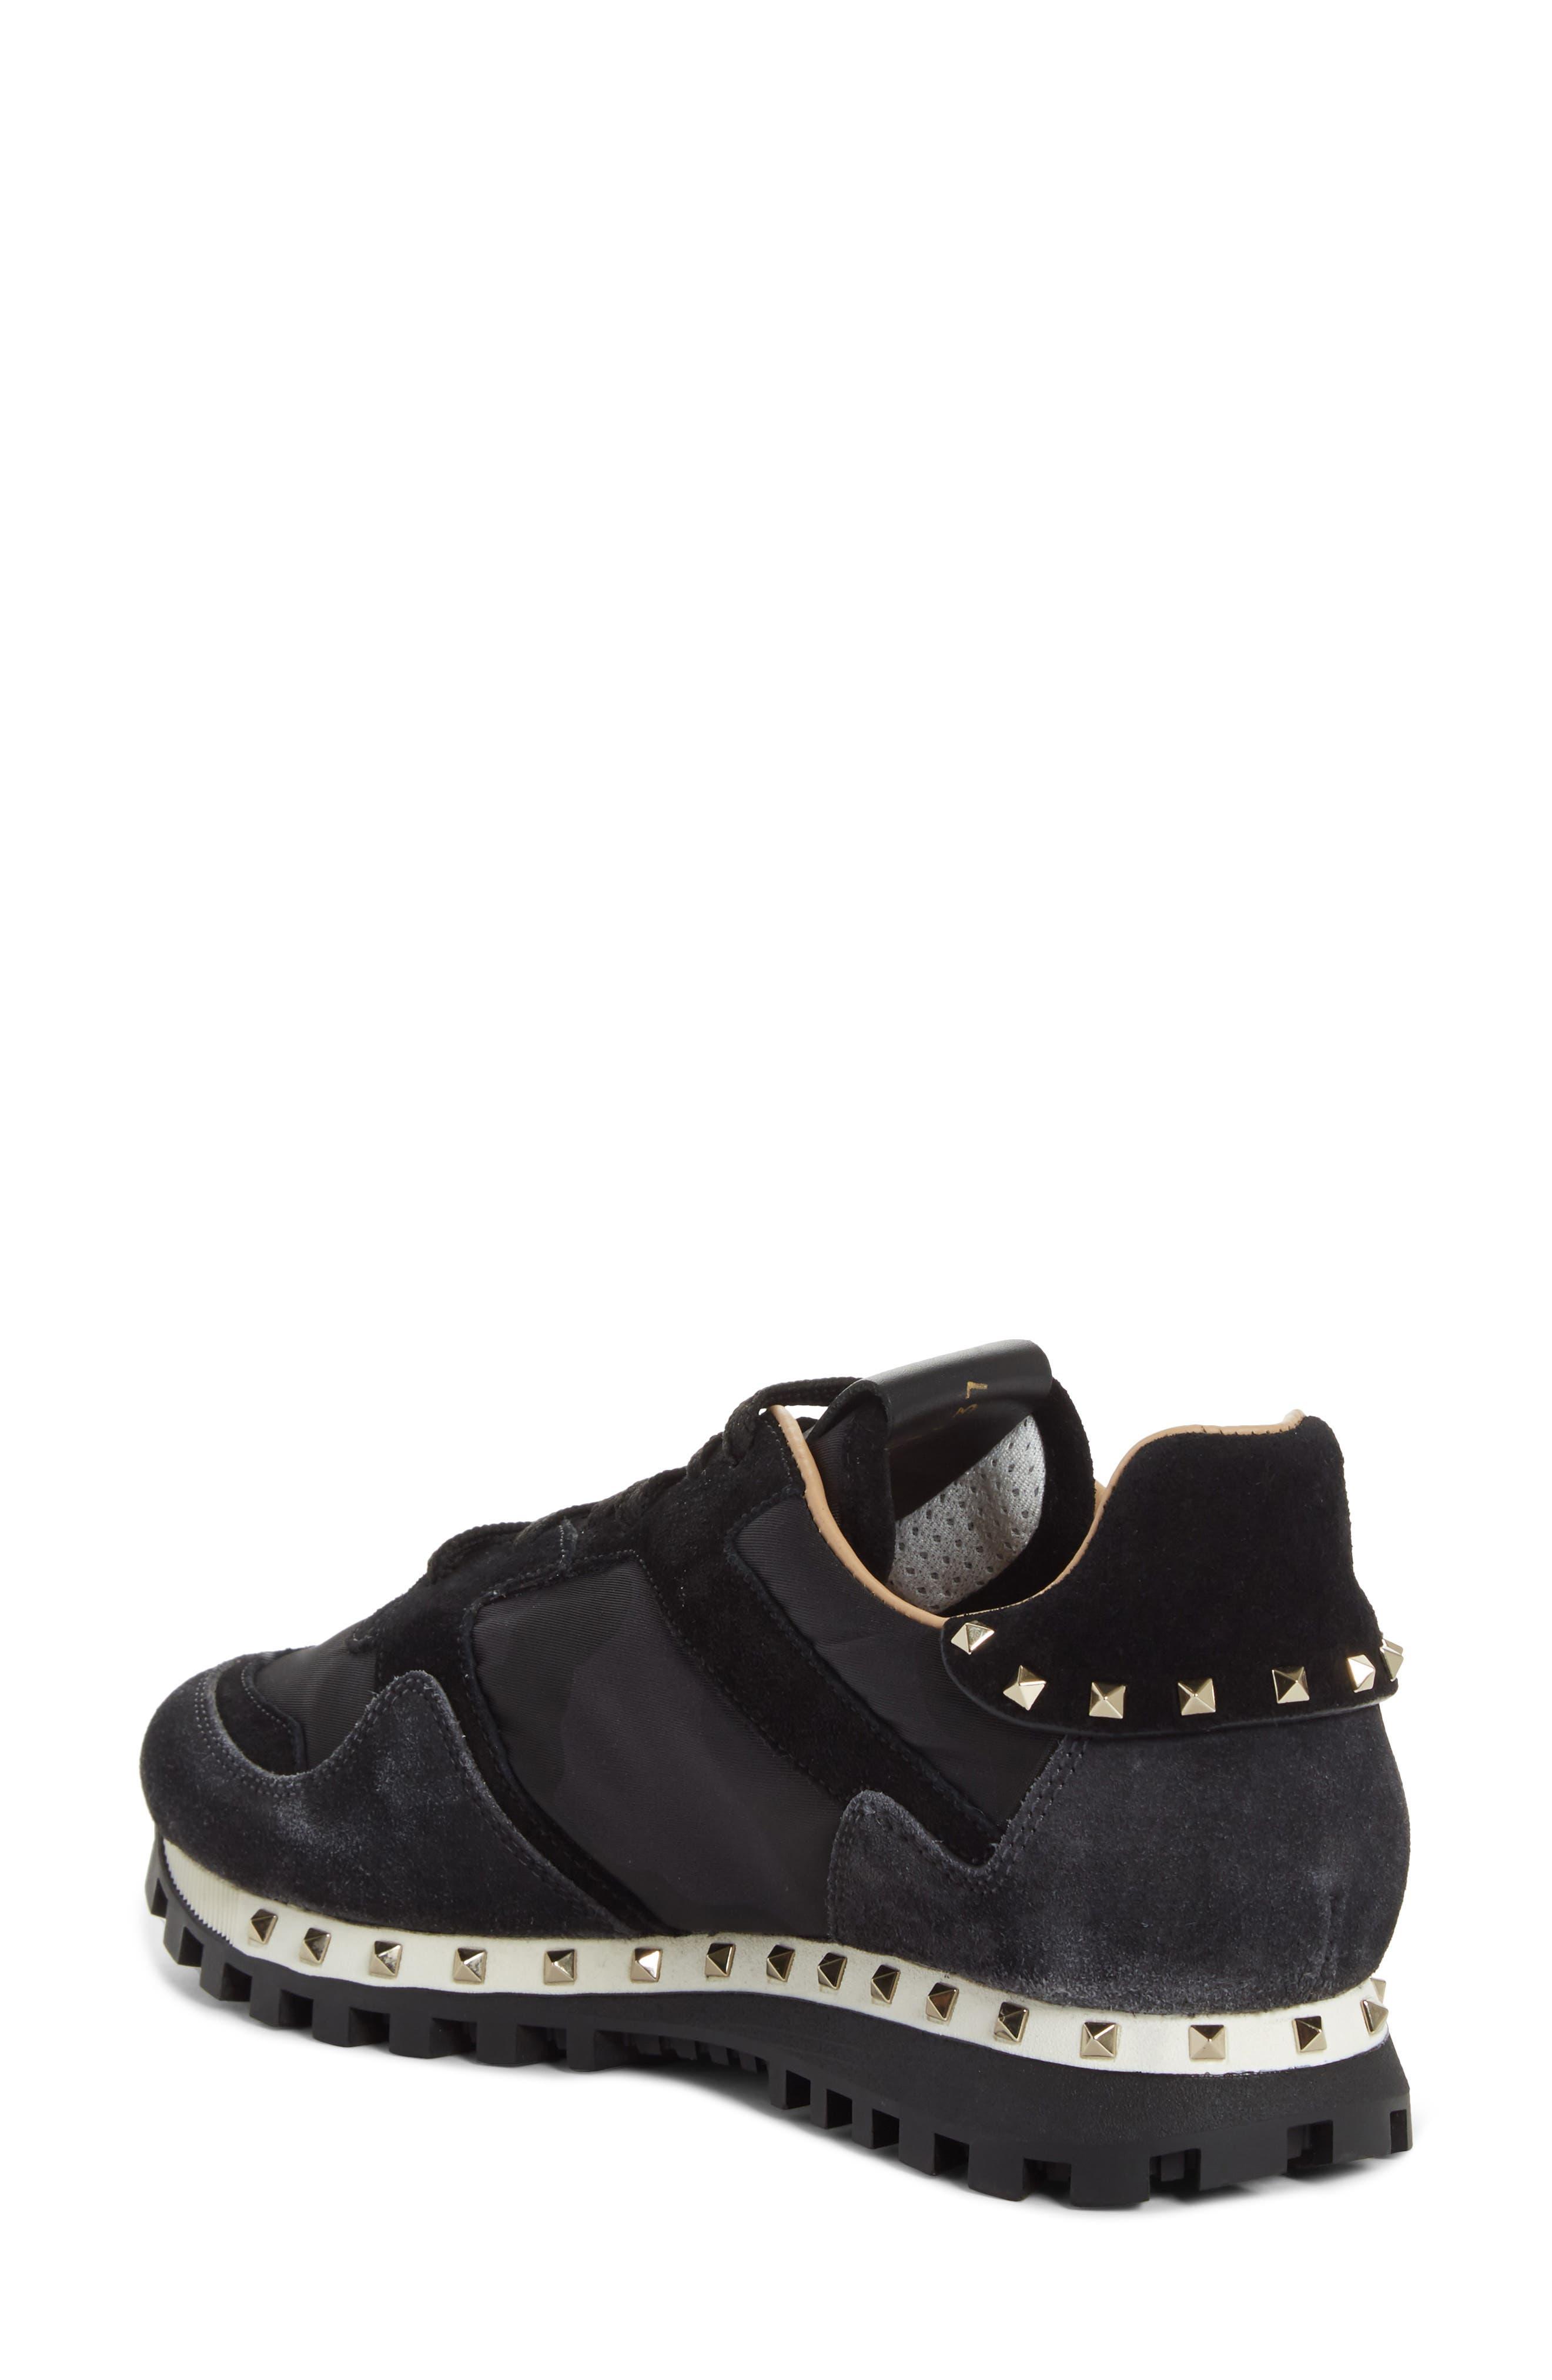 Rockstud Sneaker,                             Alternate thumbnail 2, color,                             BLACK/ GREY